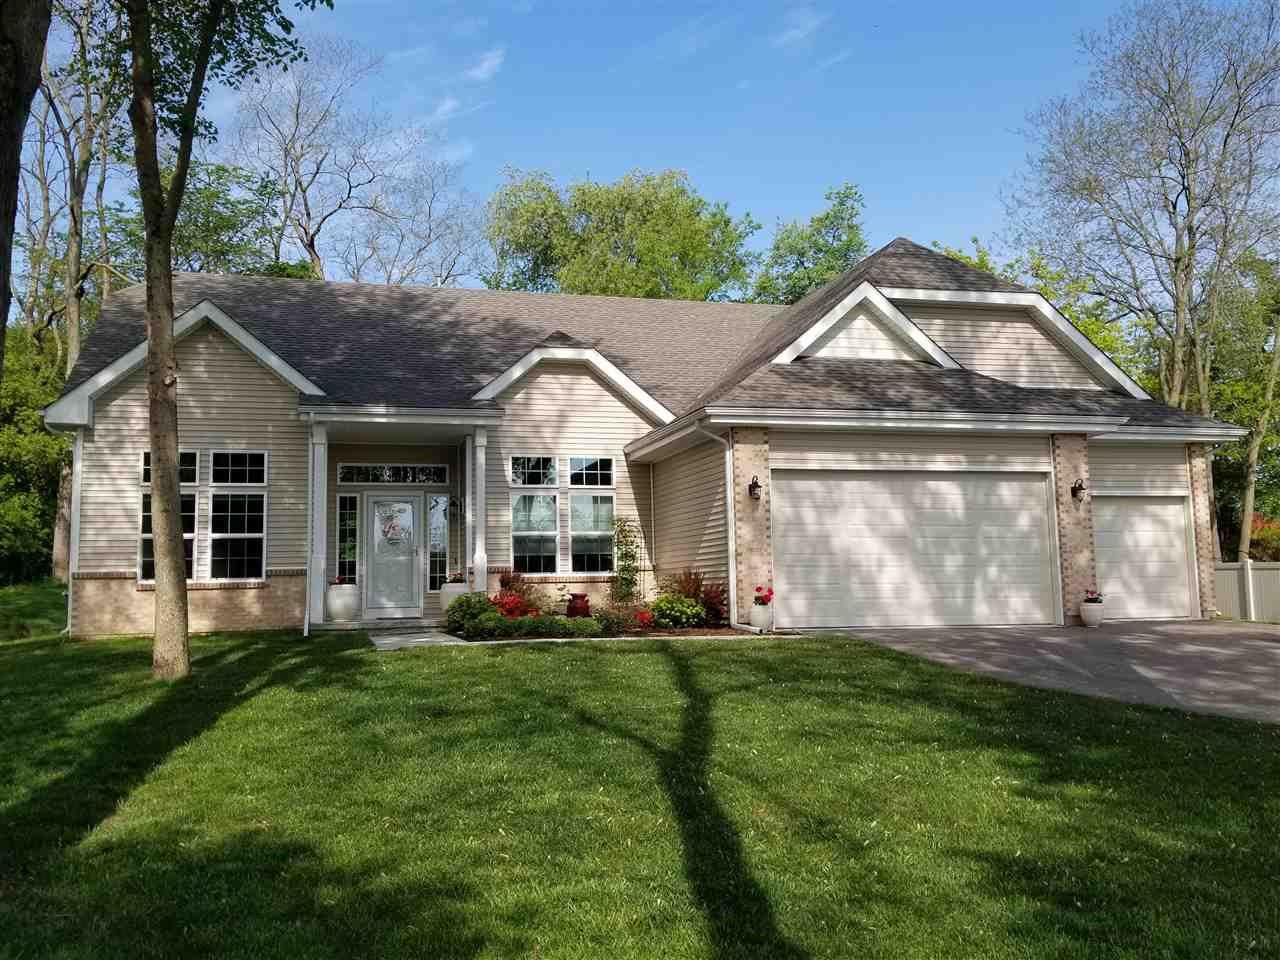 f_1909271 Real Estate in 53534 zip code